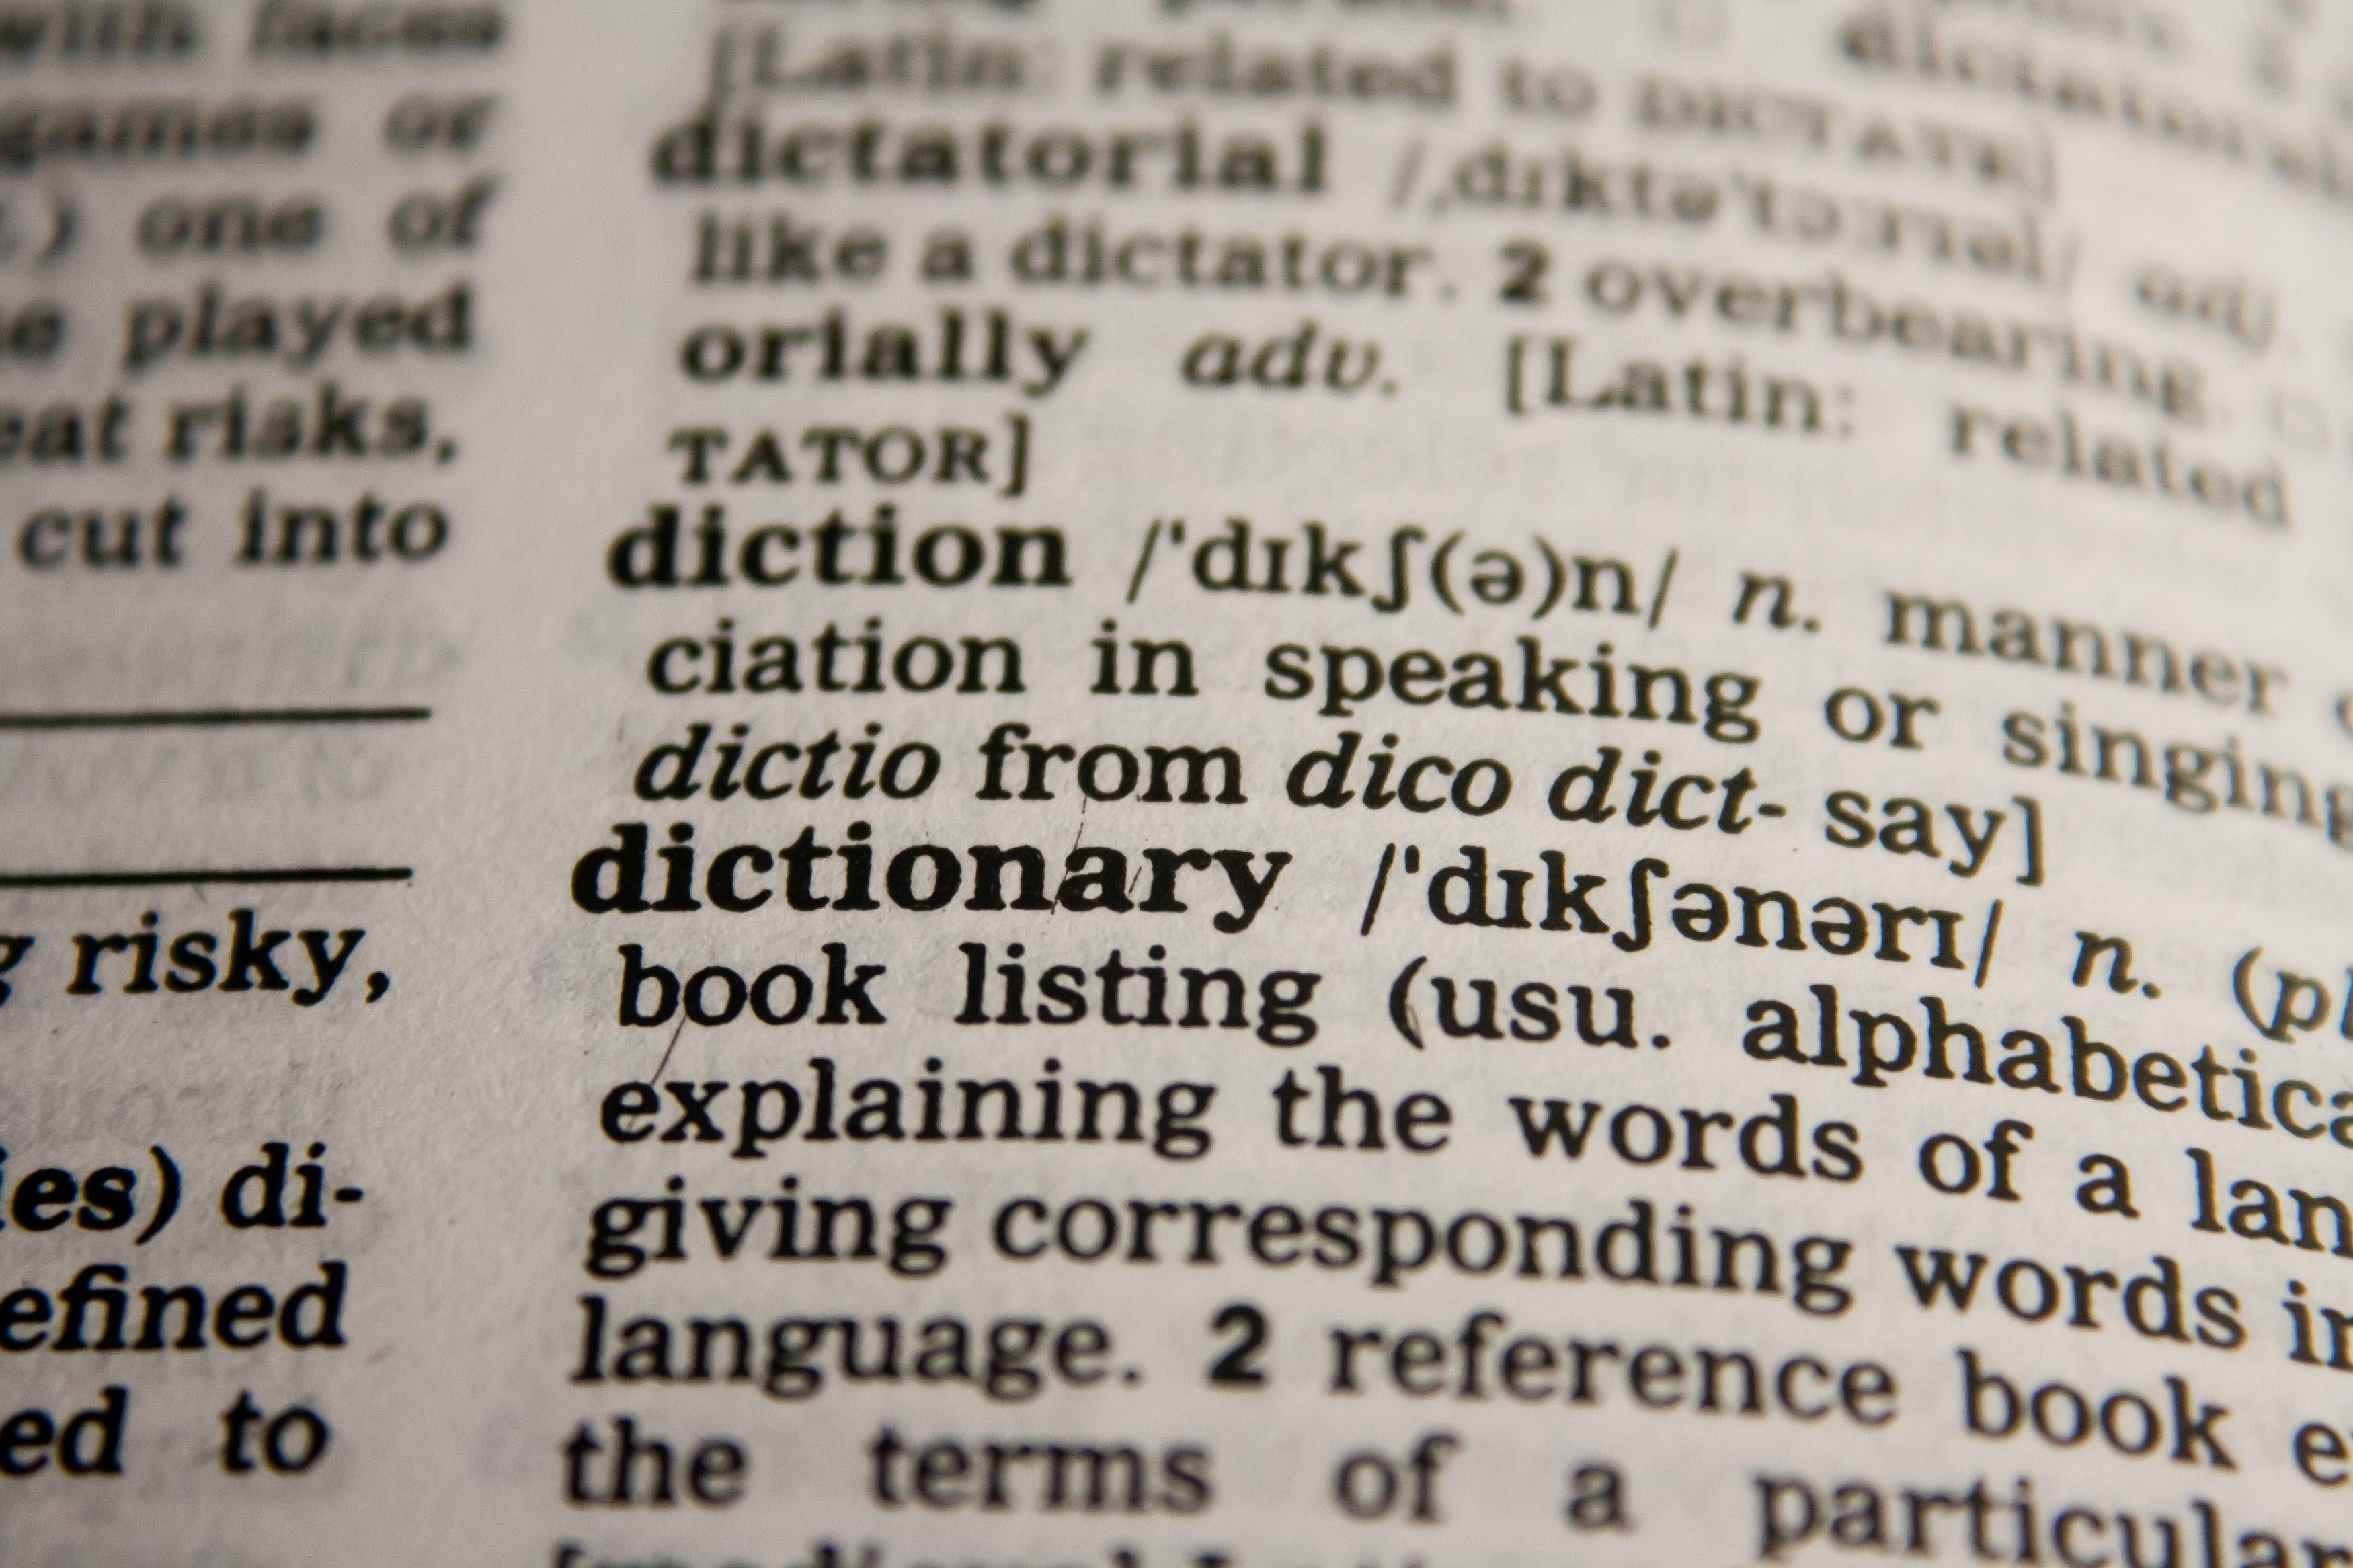 a dictionary photo symbolizing language should be set on accessible PDF